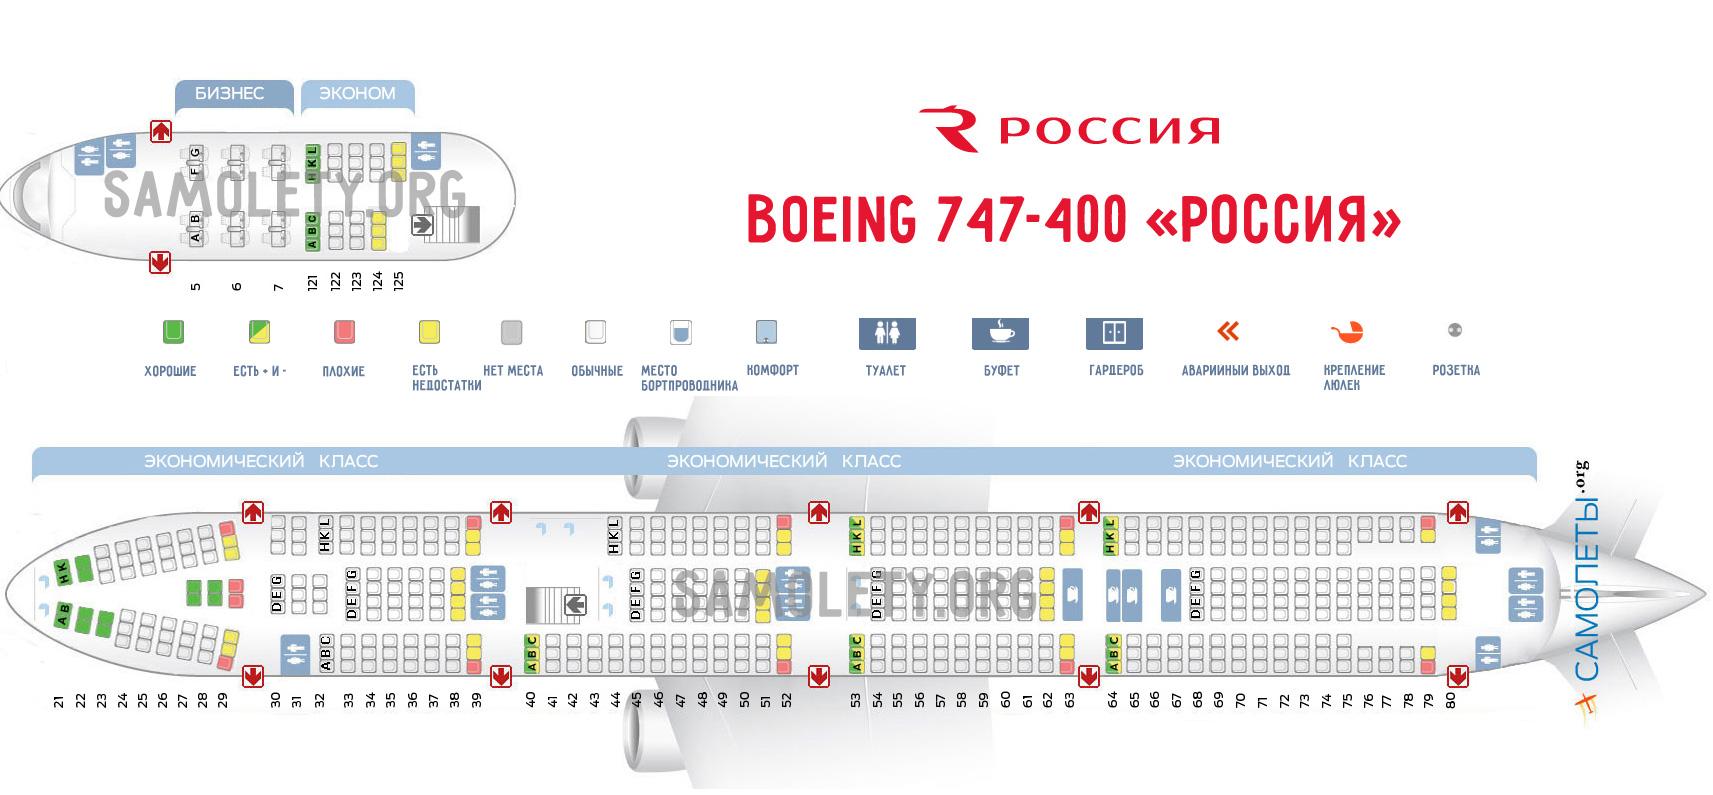 Схема салона Boeing 747-400 авиакомпании Россия